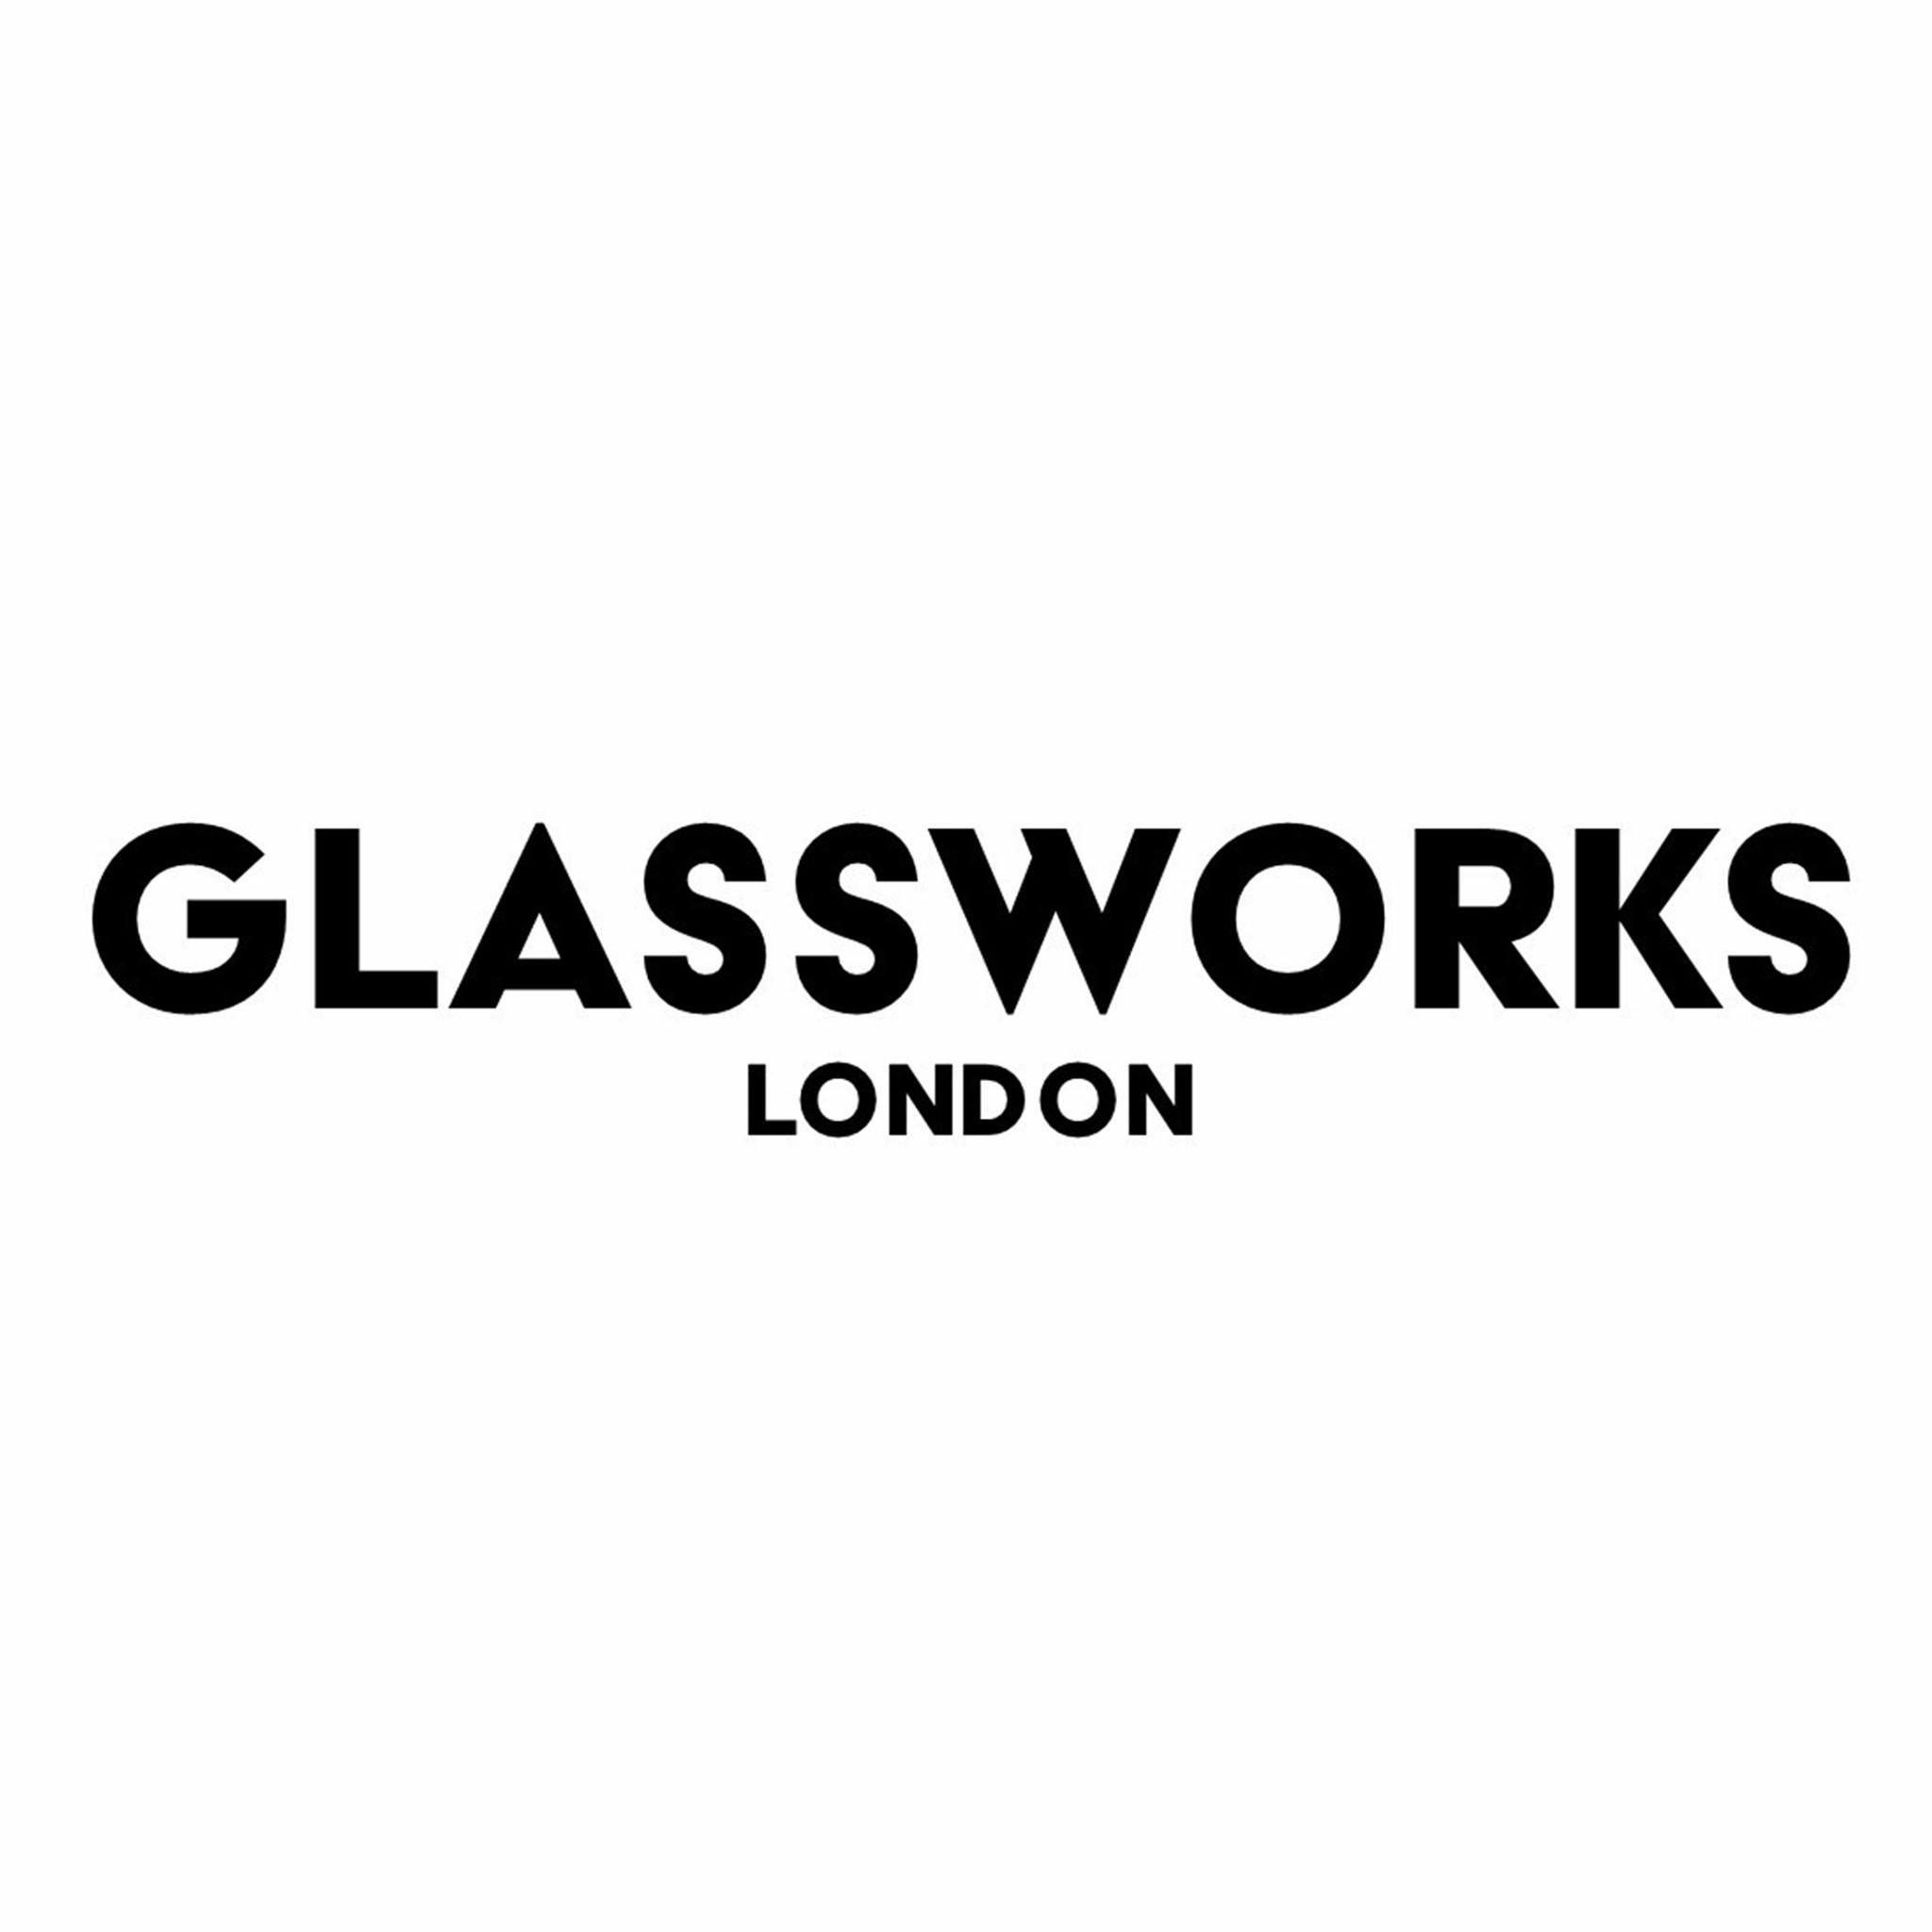 Glassworks London